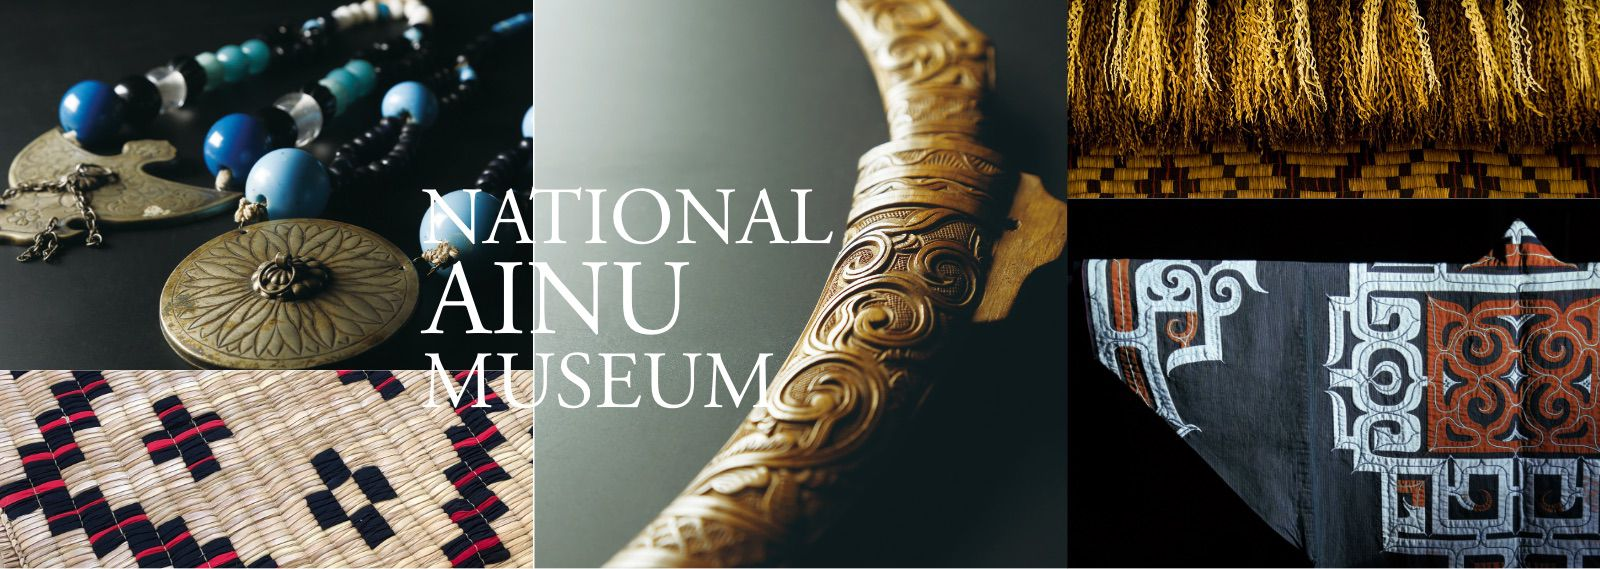 NATIONAL AINU MUSEUM